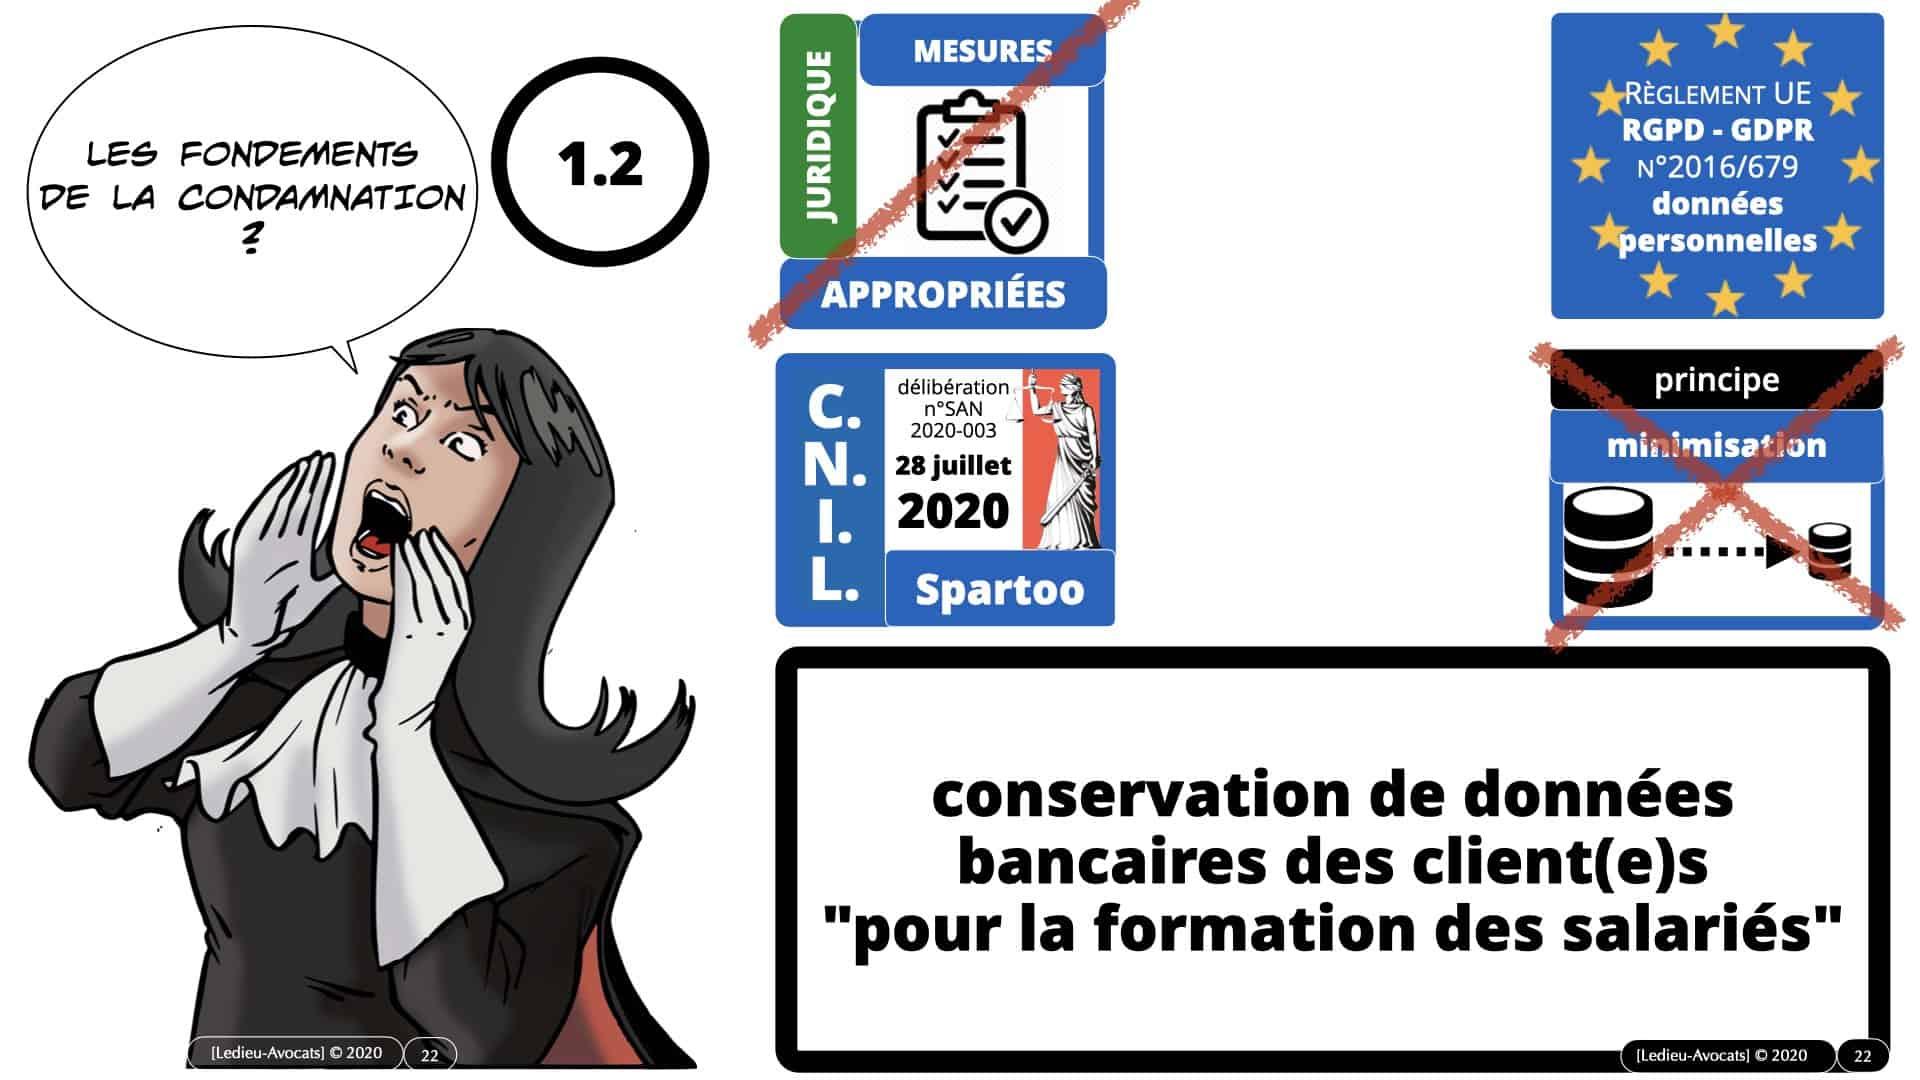 RGPD délibération CNIL Spartoo du 28 juillet 2020 n°SAN 2020-003 MOTIF 02